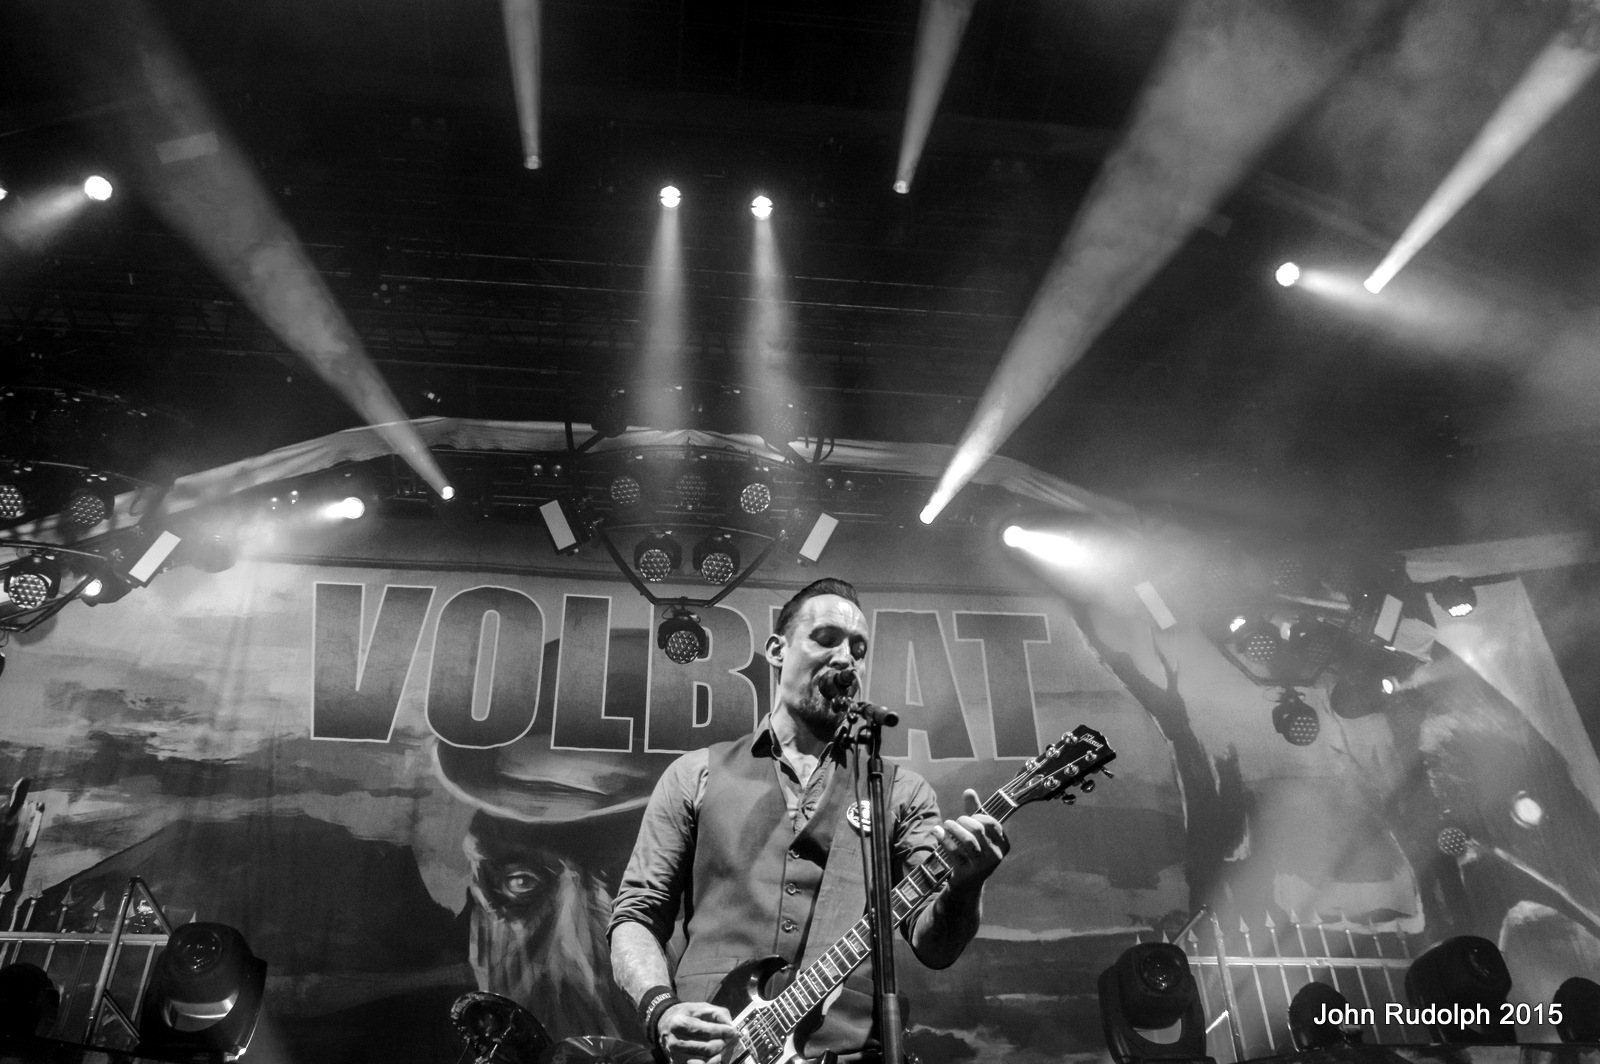 Volbeat 2015 (1 of 1)-7